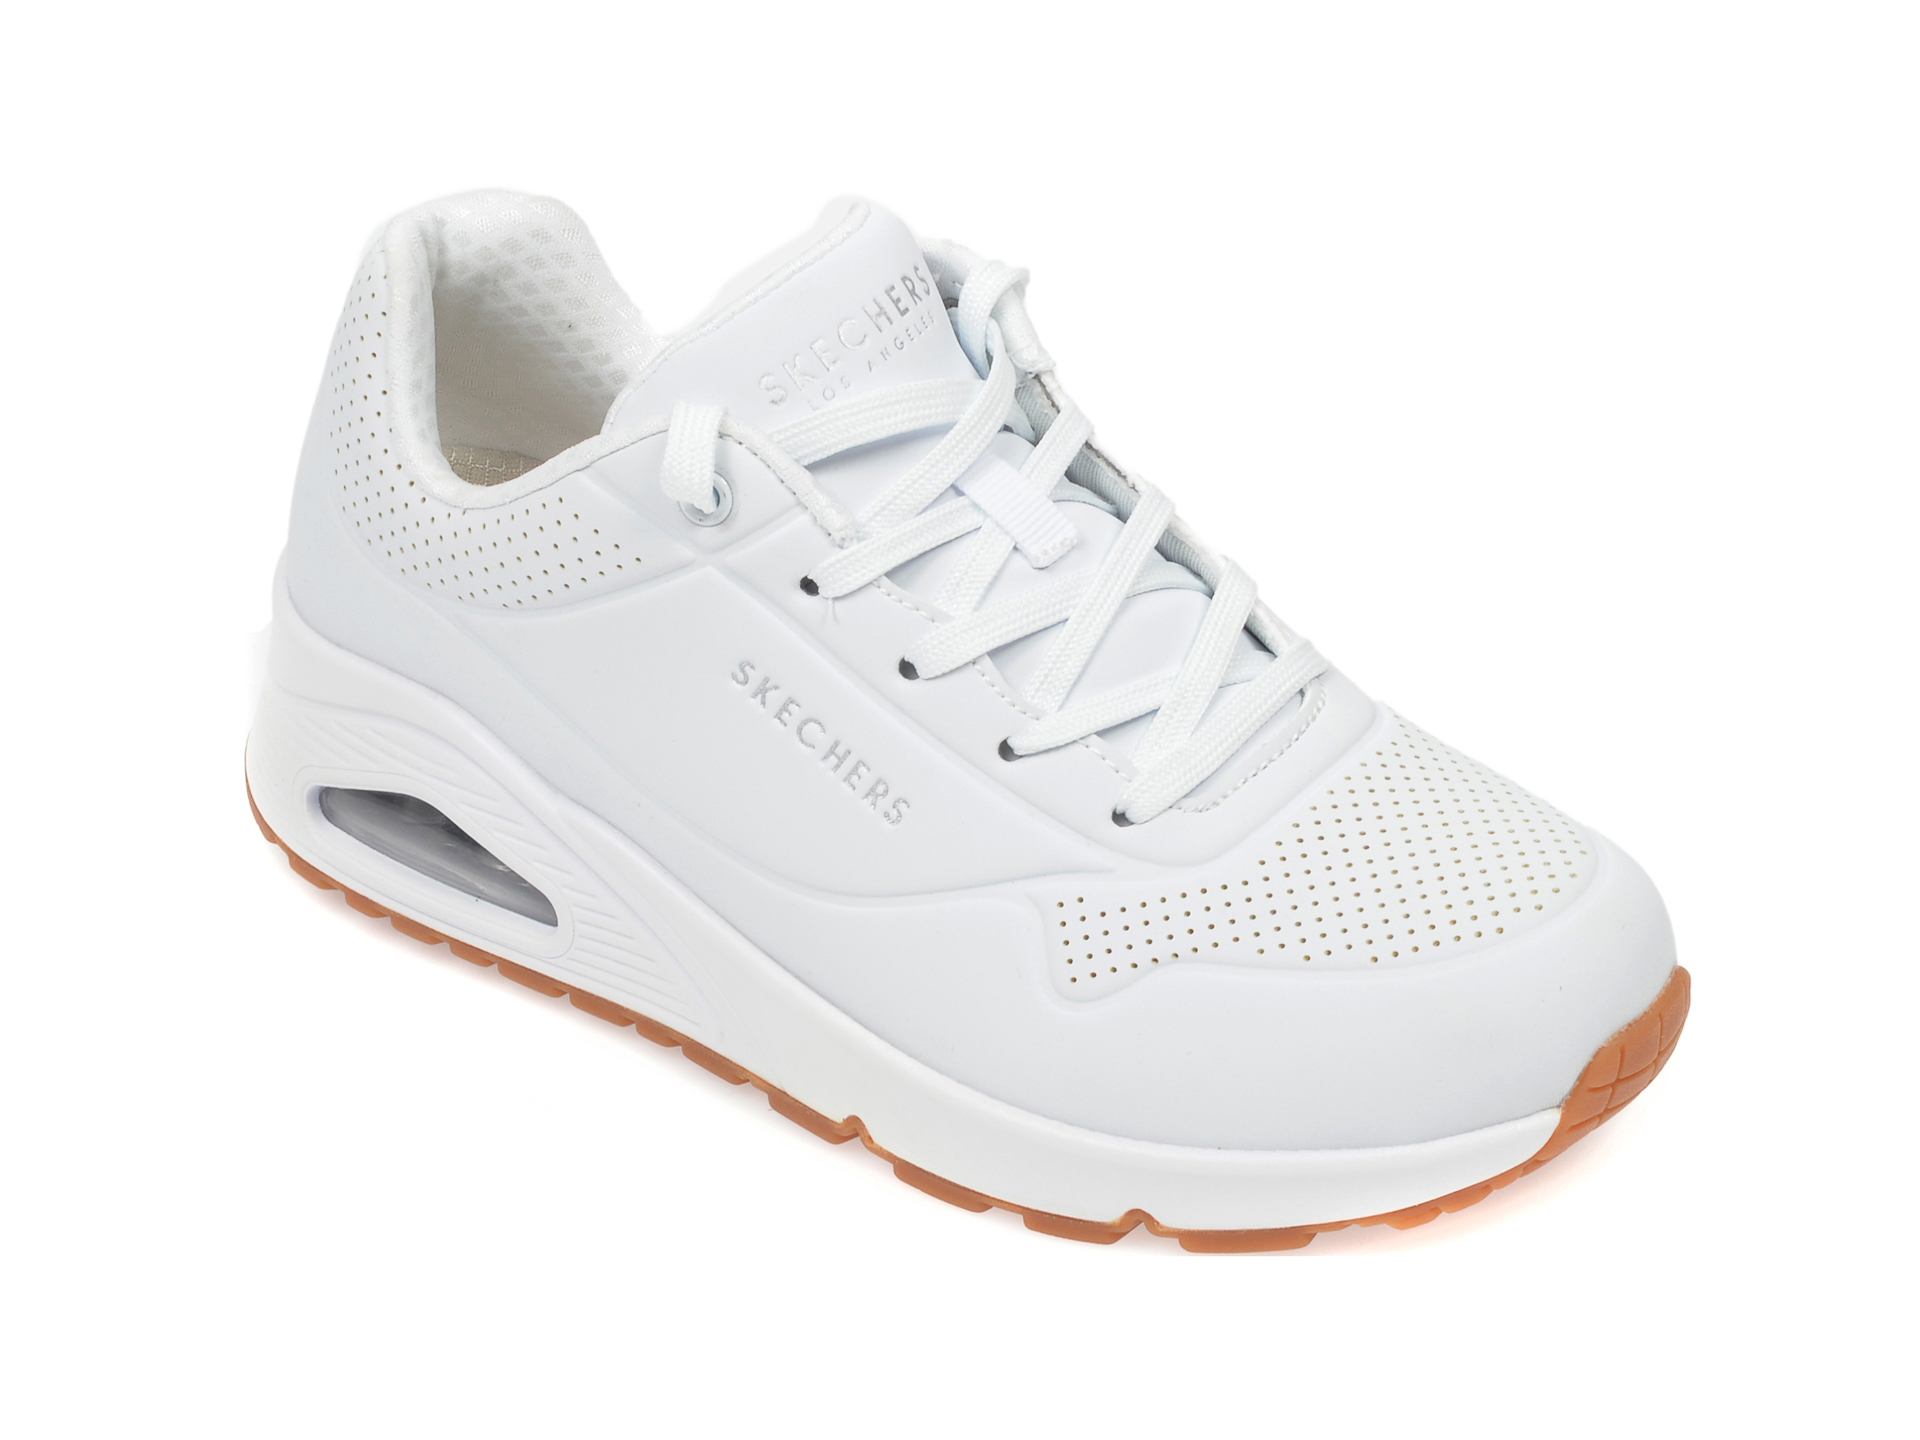 Pantofi sport SKECHERS albi, Uno Stand On Air, din piele ecologica New